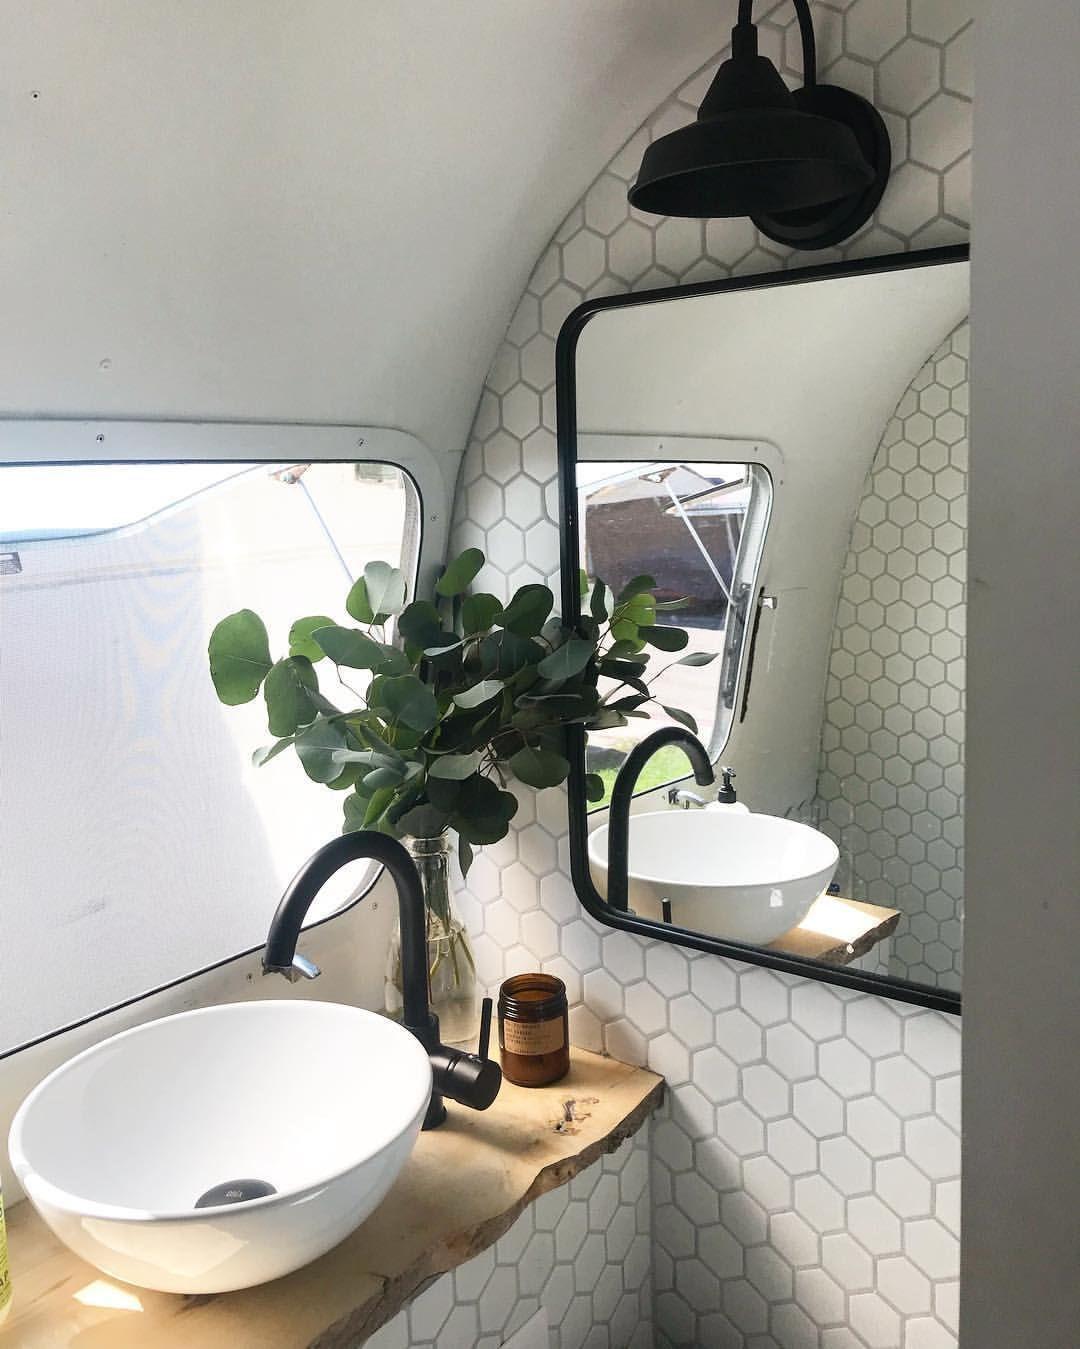 Airstream Bathroom Renovation Hex Tile Wall And Beautiful Faucet And Sink Bathroomrenovations Airstream Bathroom Caravan Makeover Camper Decor [ 1349 x 1080 Pixel ]